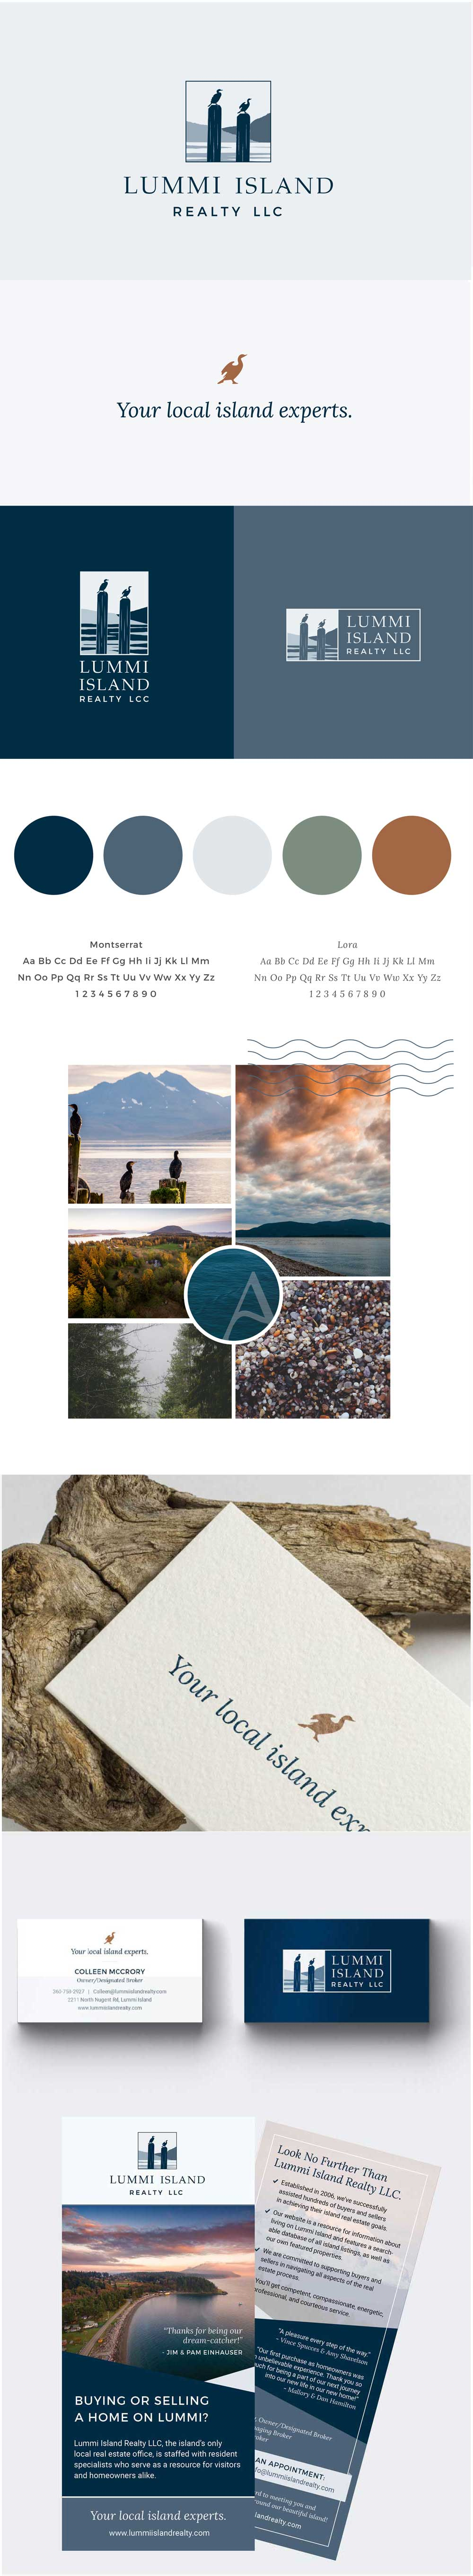 lummi-island-realty-brand-board.jpg